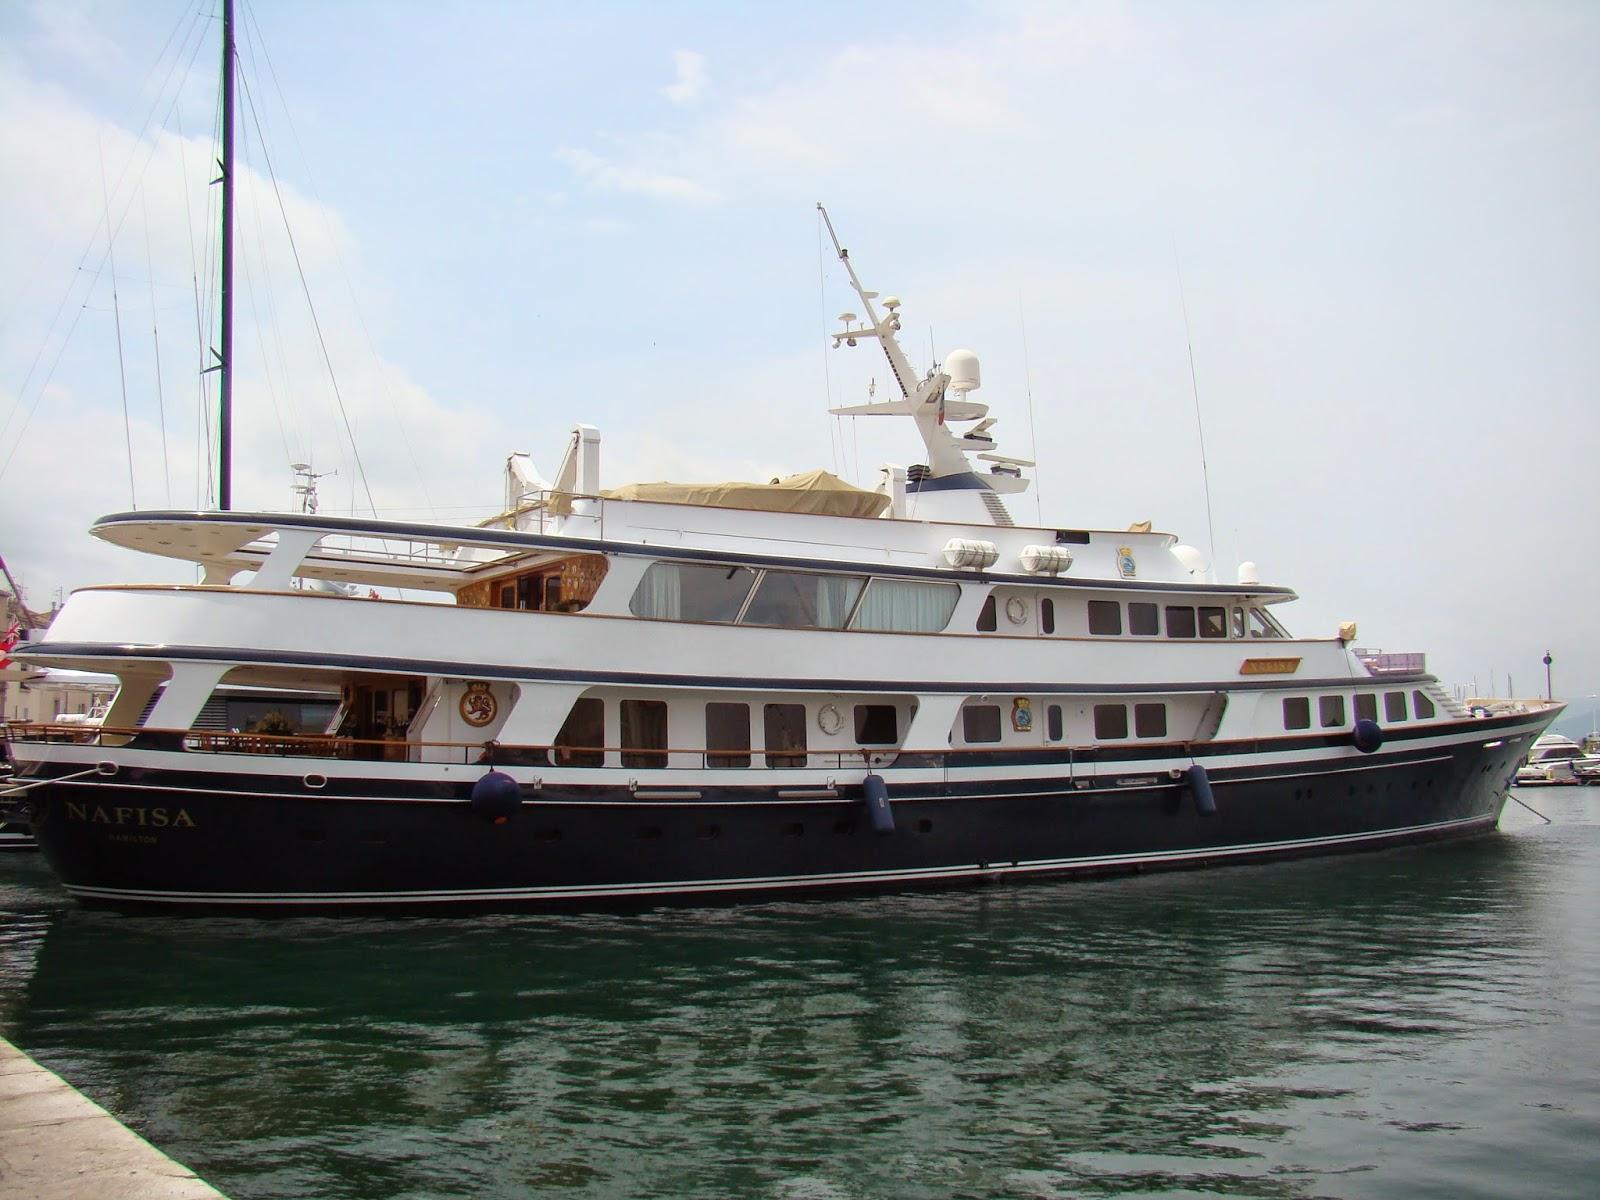 yacht Nafisa - www.superyachtfan.com